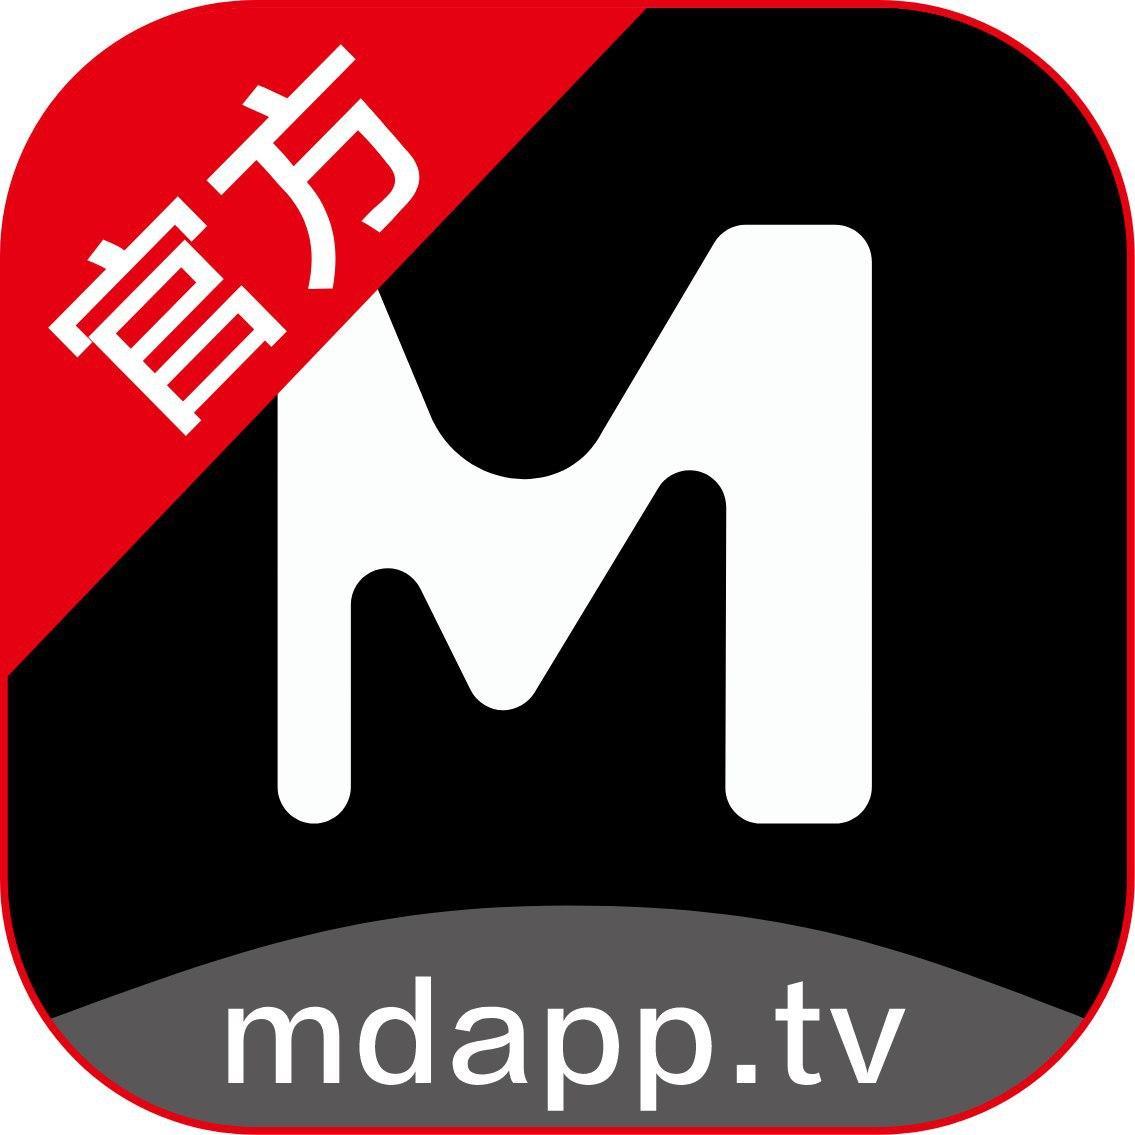 md2.pub.app